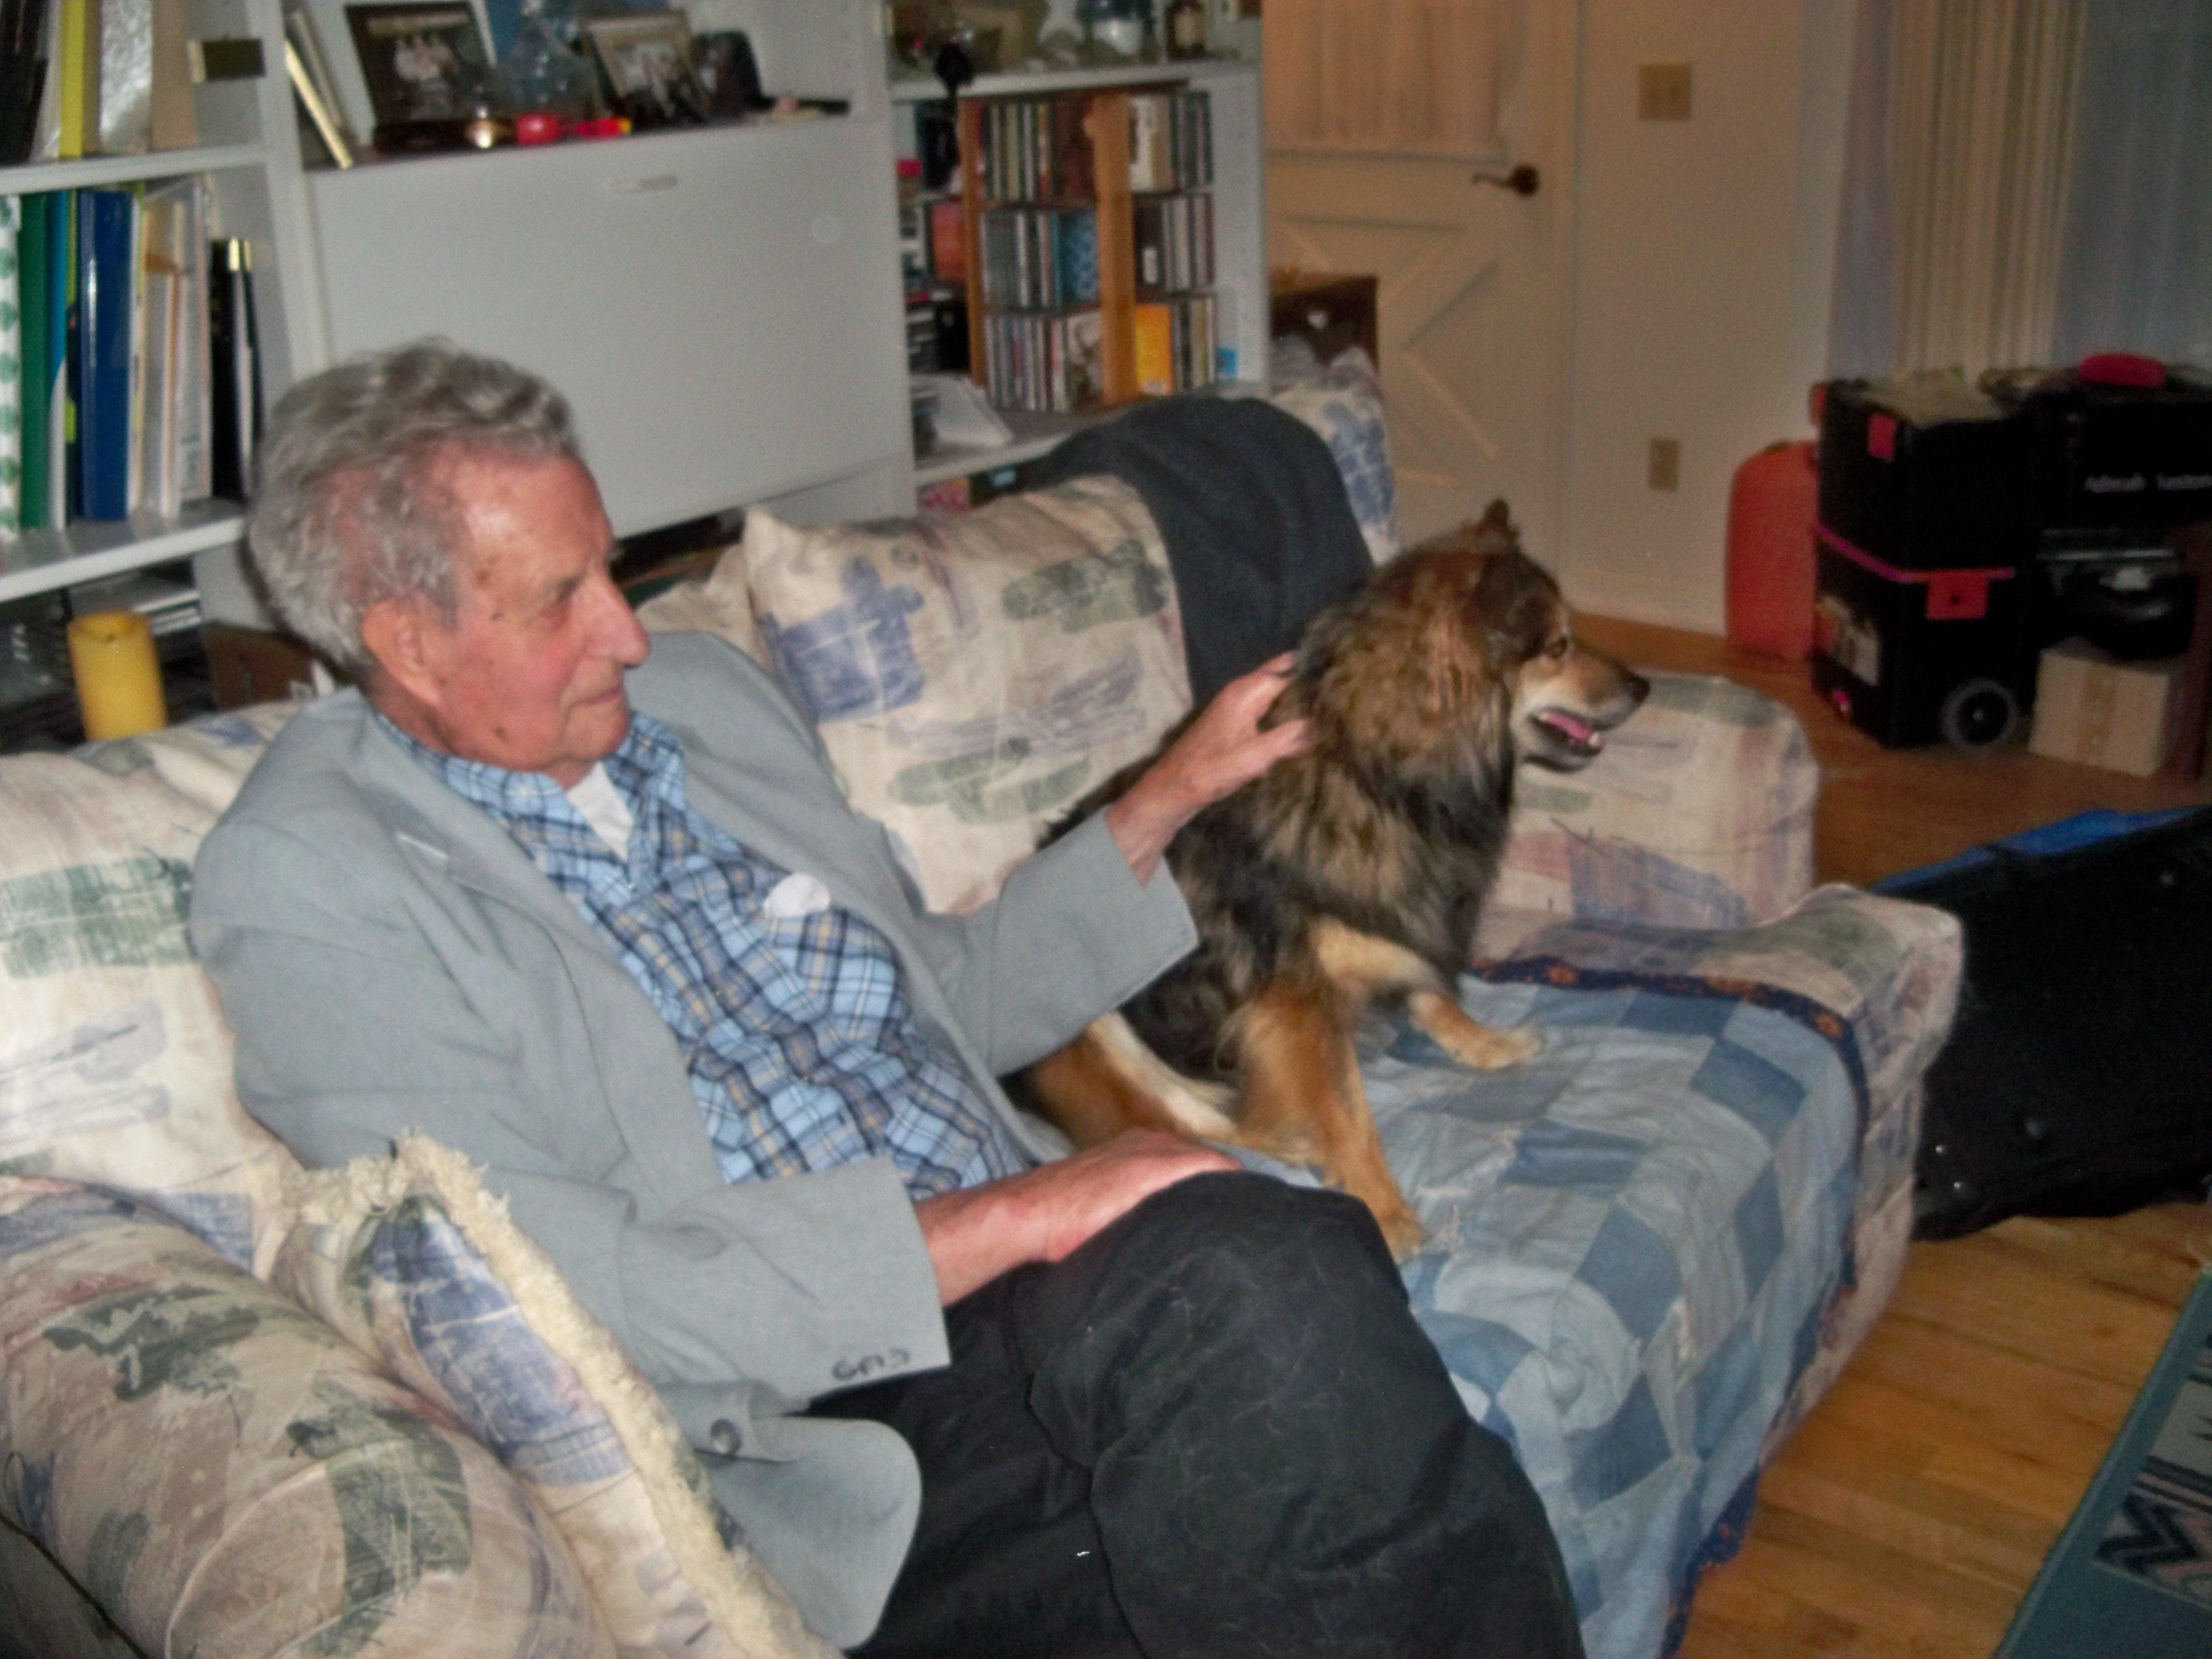 Dad Saxton with Owen, Grand Ledge MI